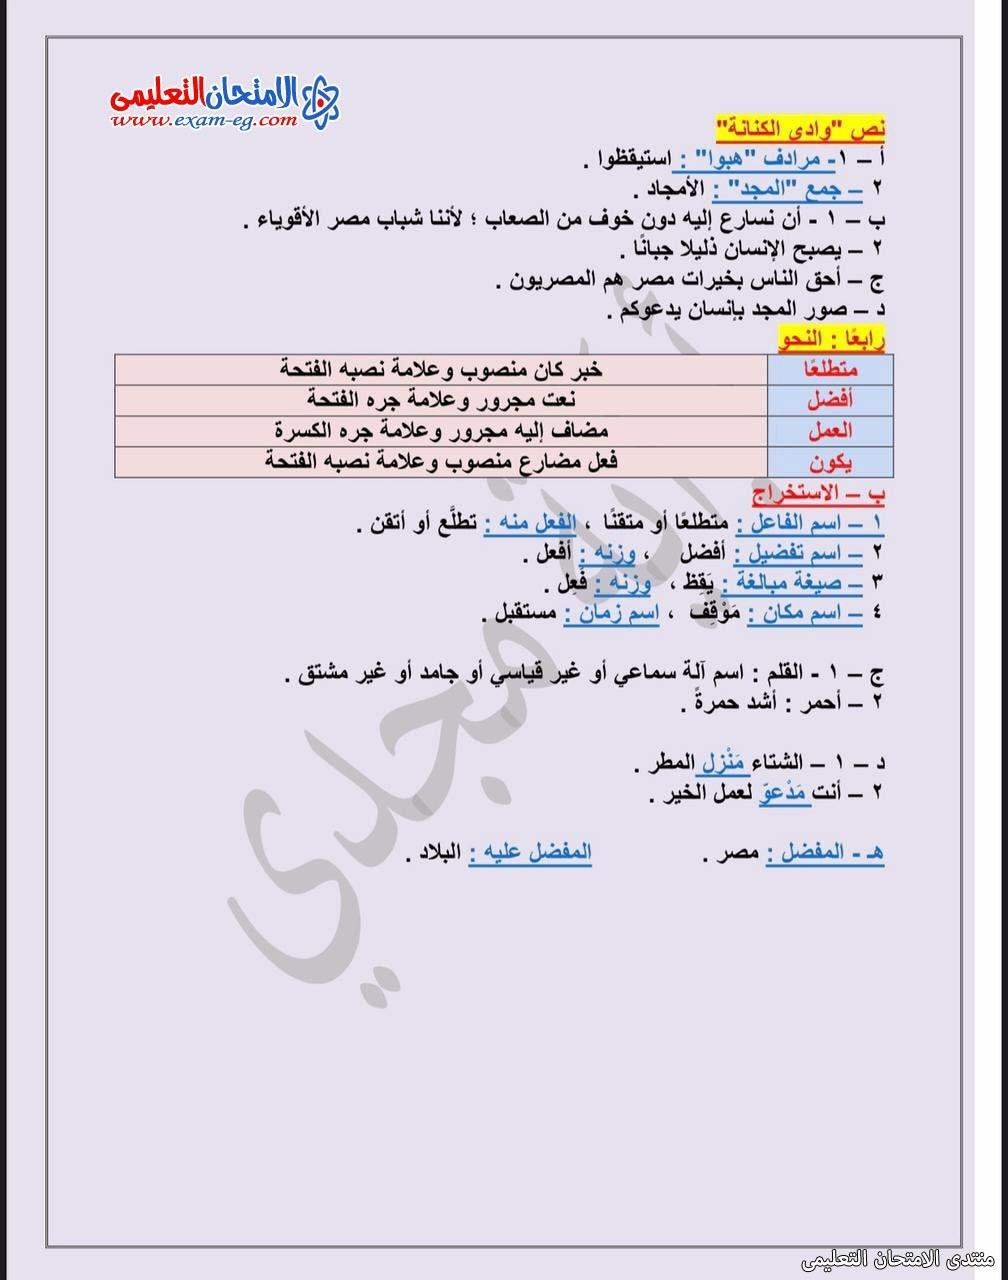 exam-eg.com_162288844745654.jpg